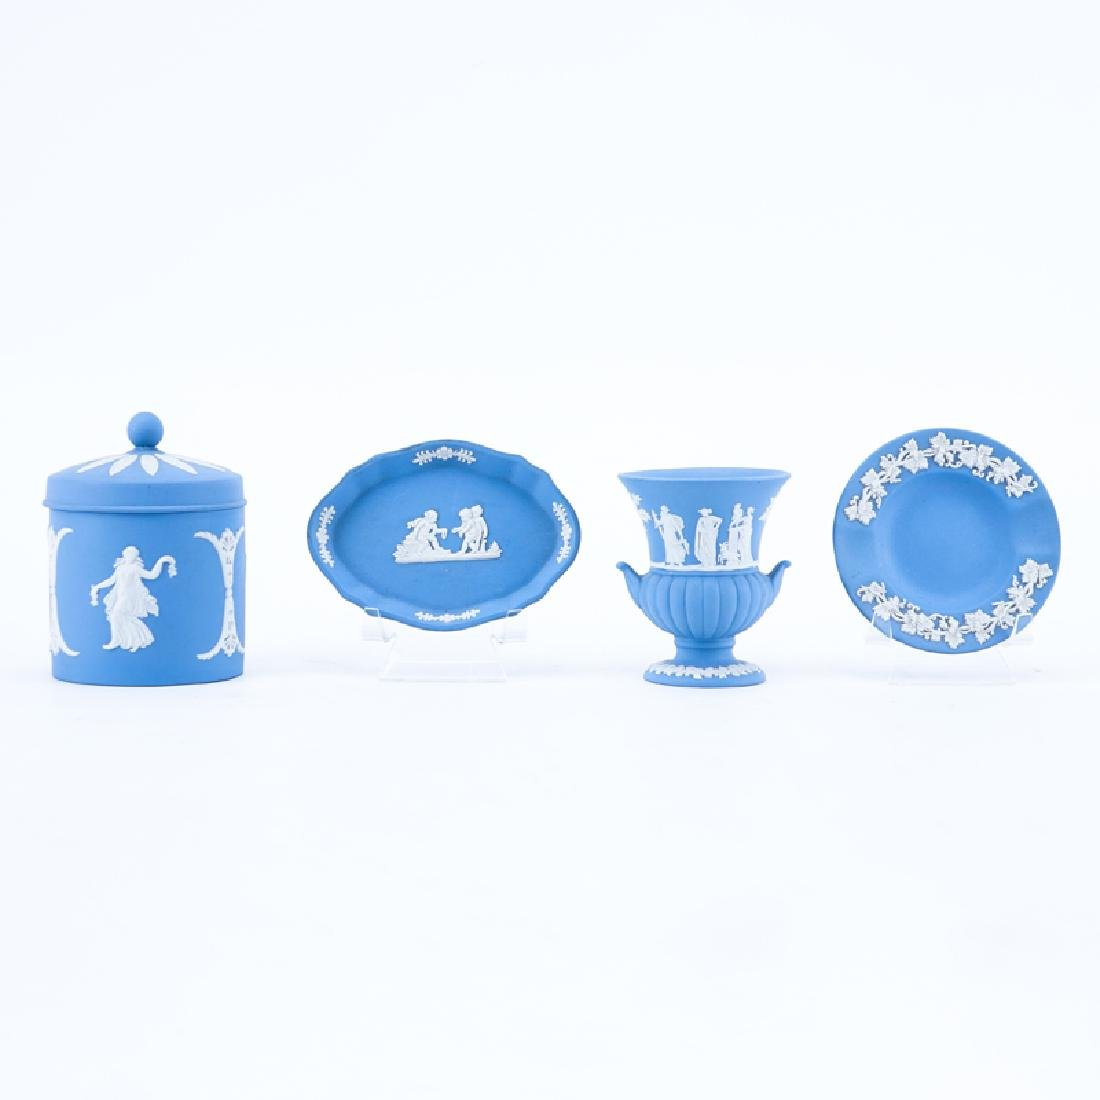 Collection of Four (4) Wedgwood Jasperware Tableware